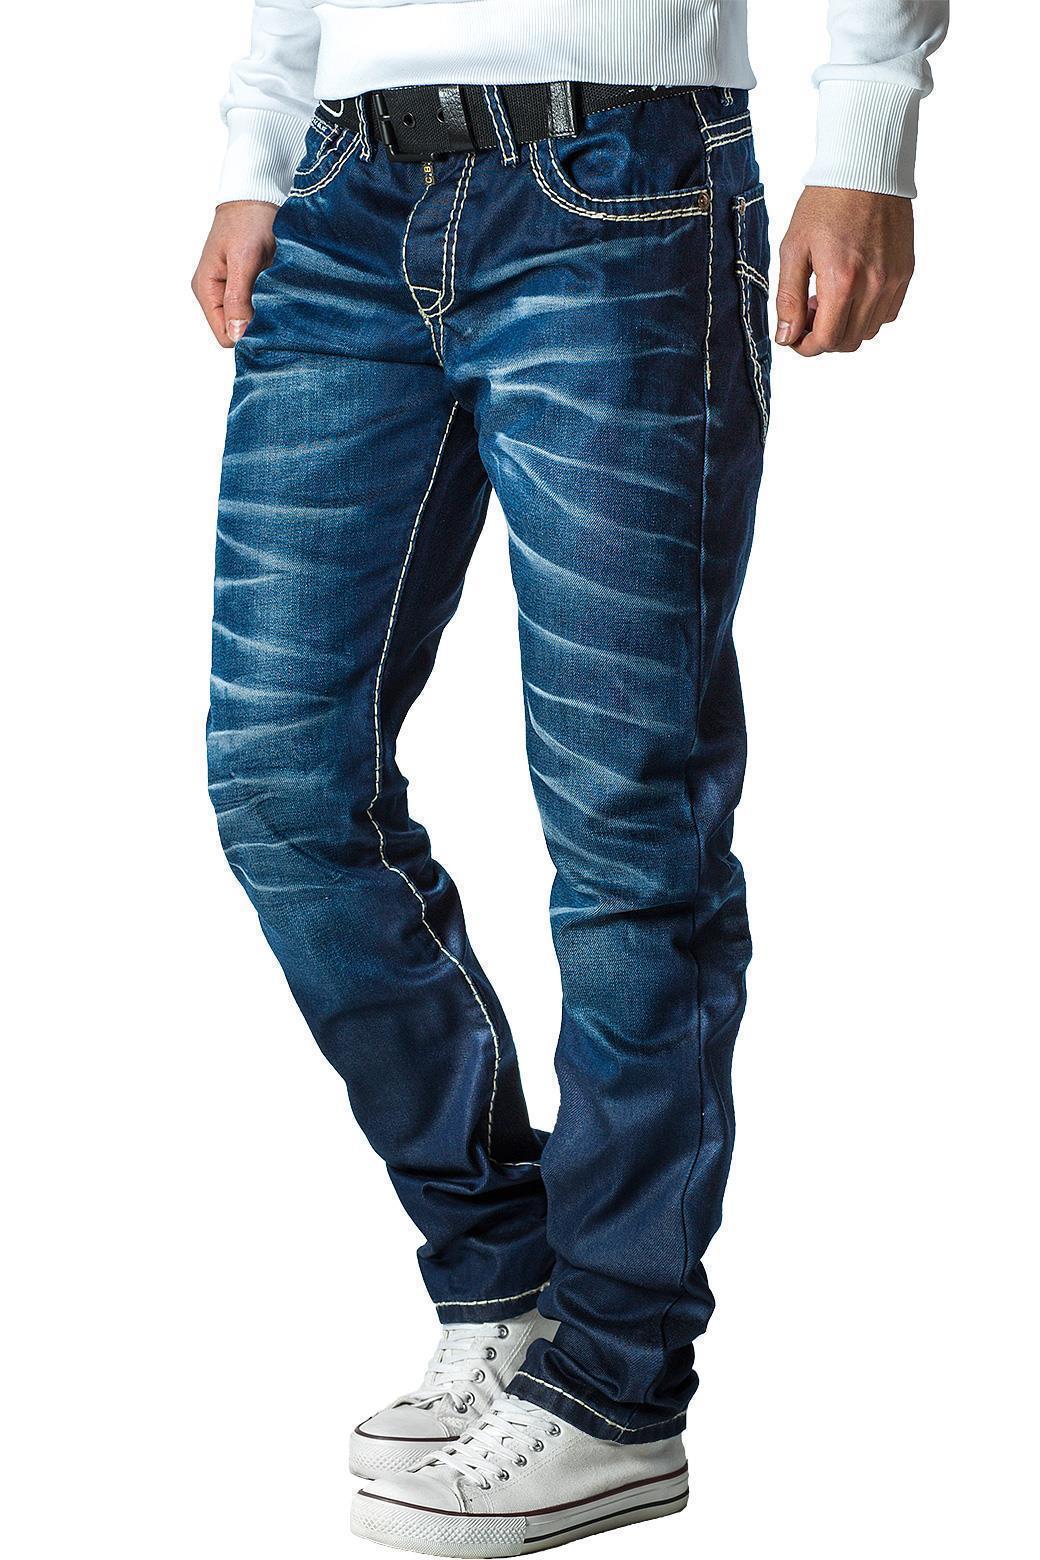 Cipo-amp-Baxx-Uomo-Jeans-Pantaloni-ricamate-Biker-Style-streetwear-nervature-pattern-Dope miniatura 17